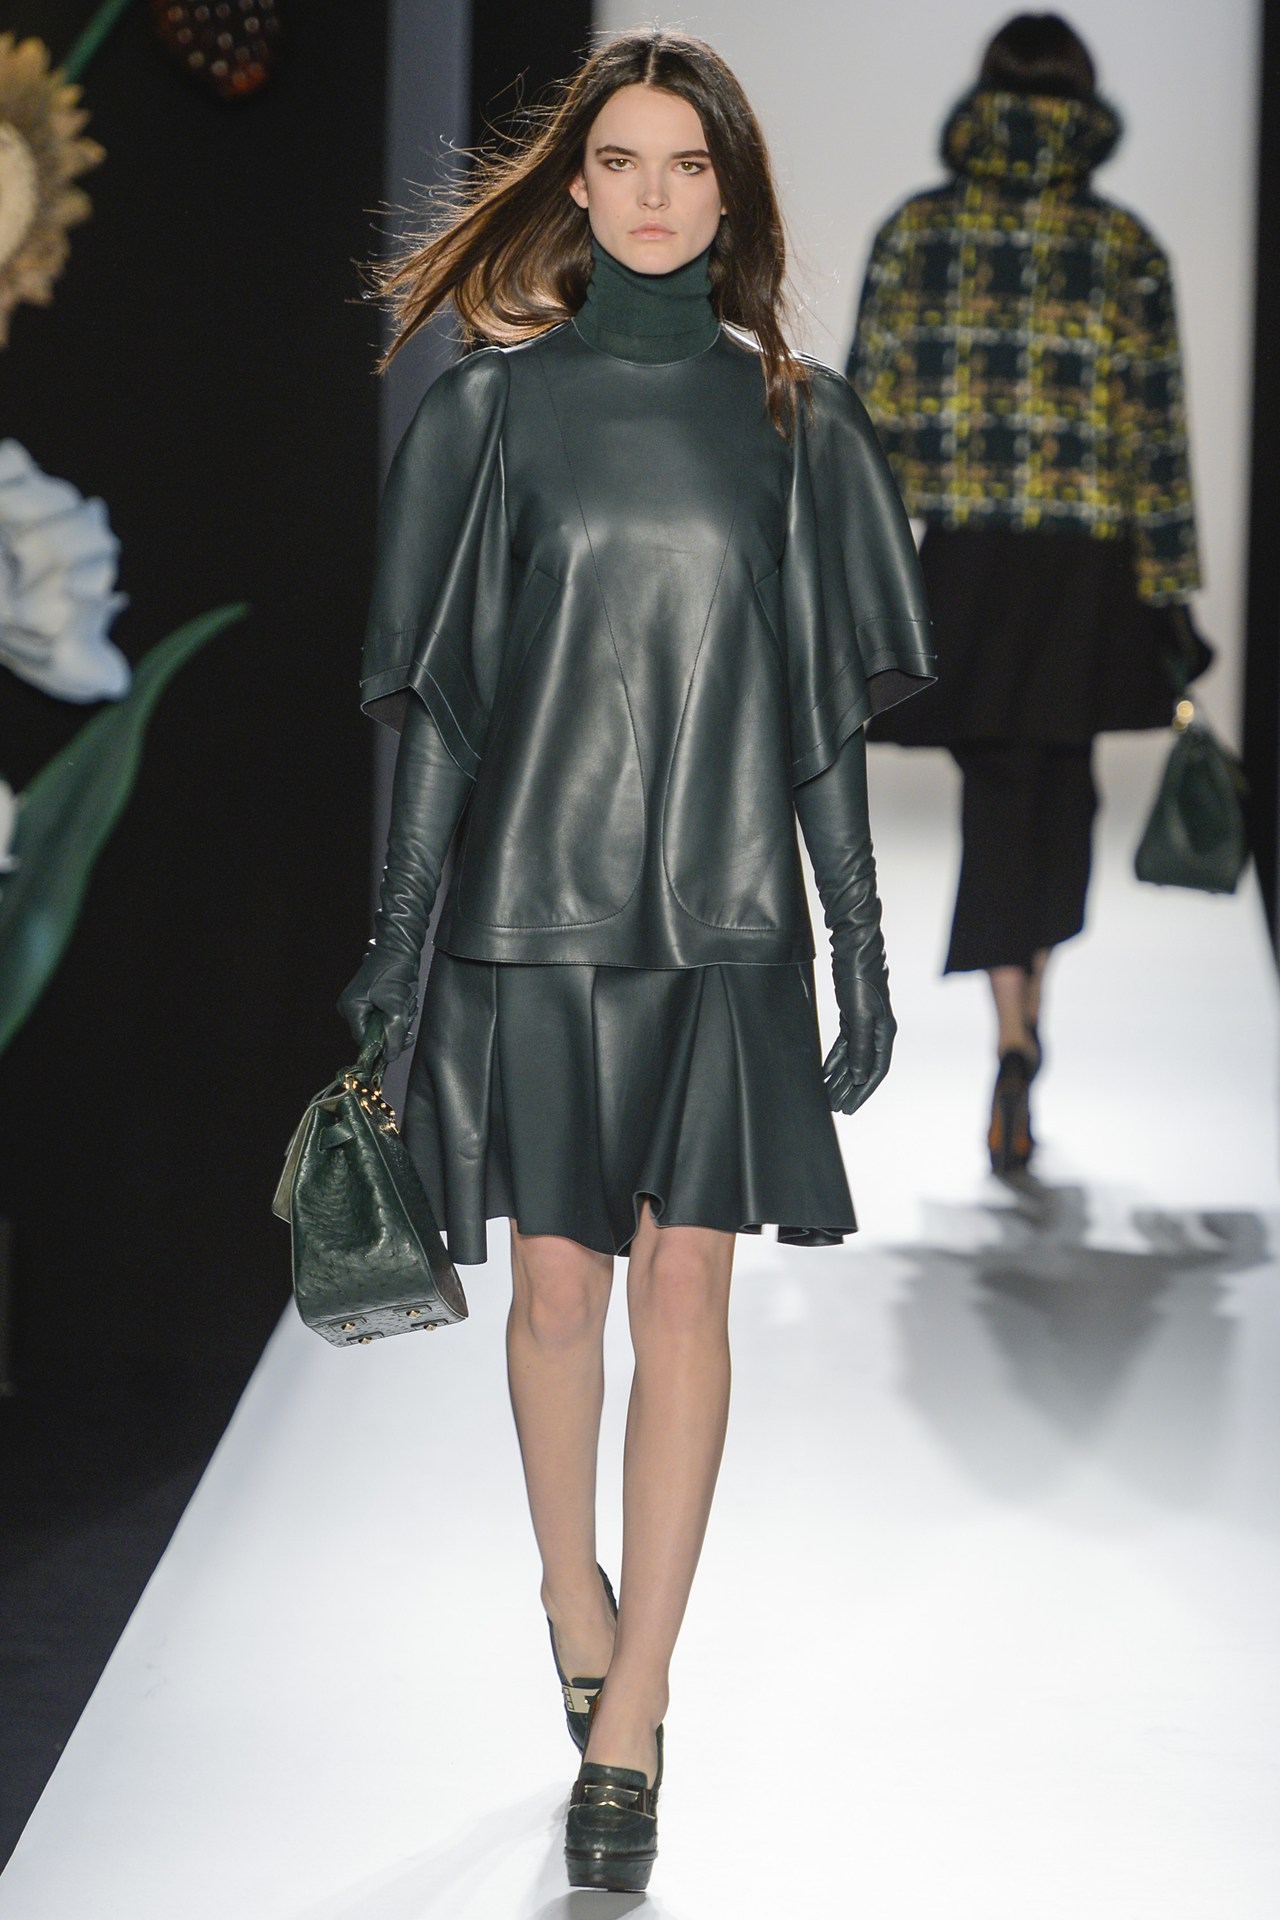 Leather Leather Leather Blog: Mulberry Leather Fashion